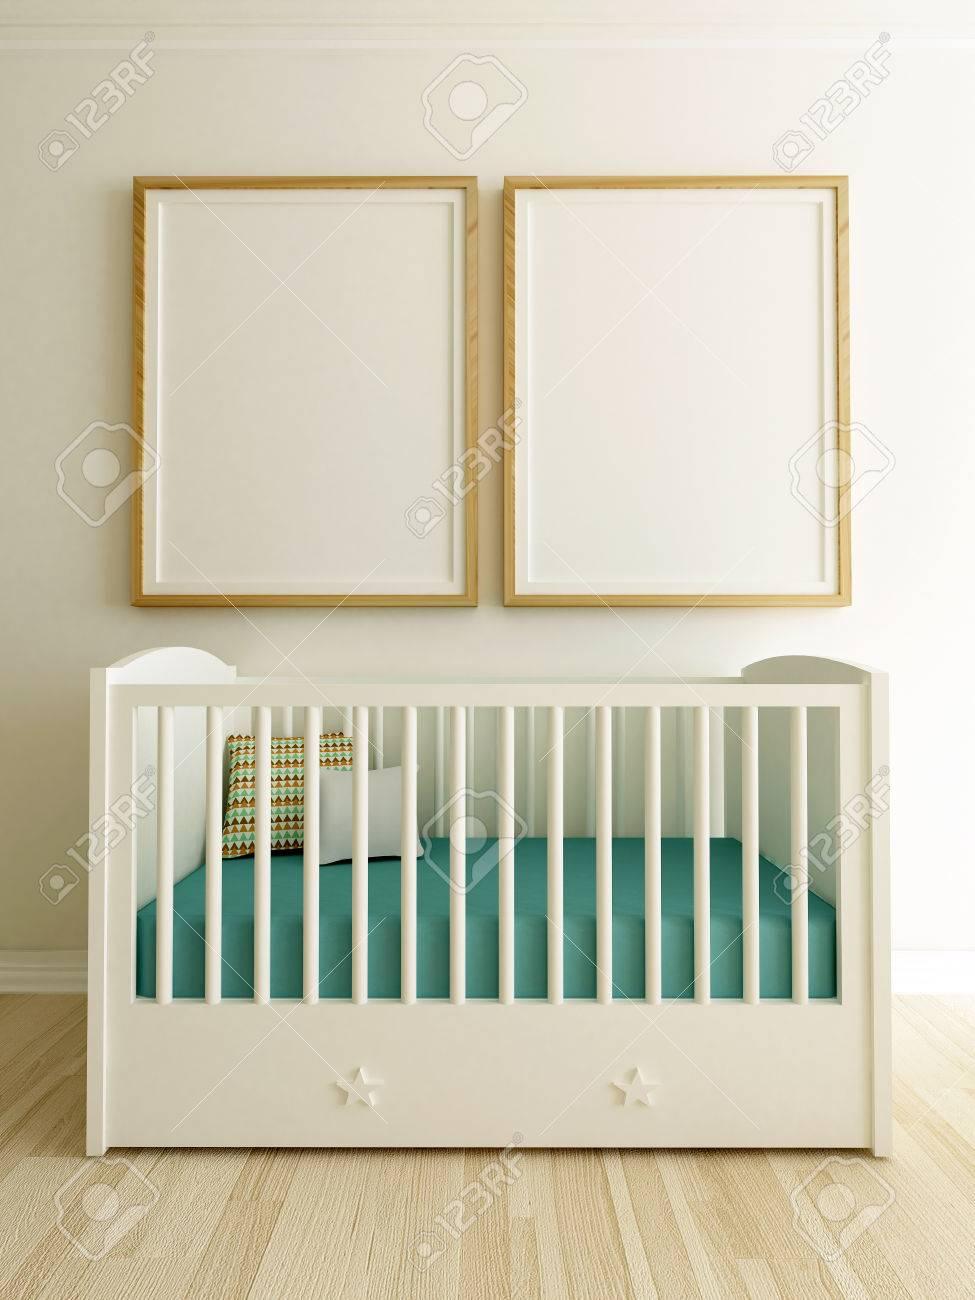 Poster Mockup In Baby Room Interior - 78129197